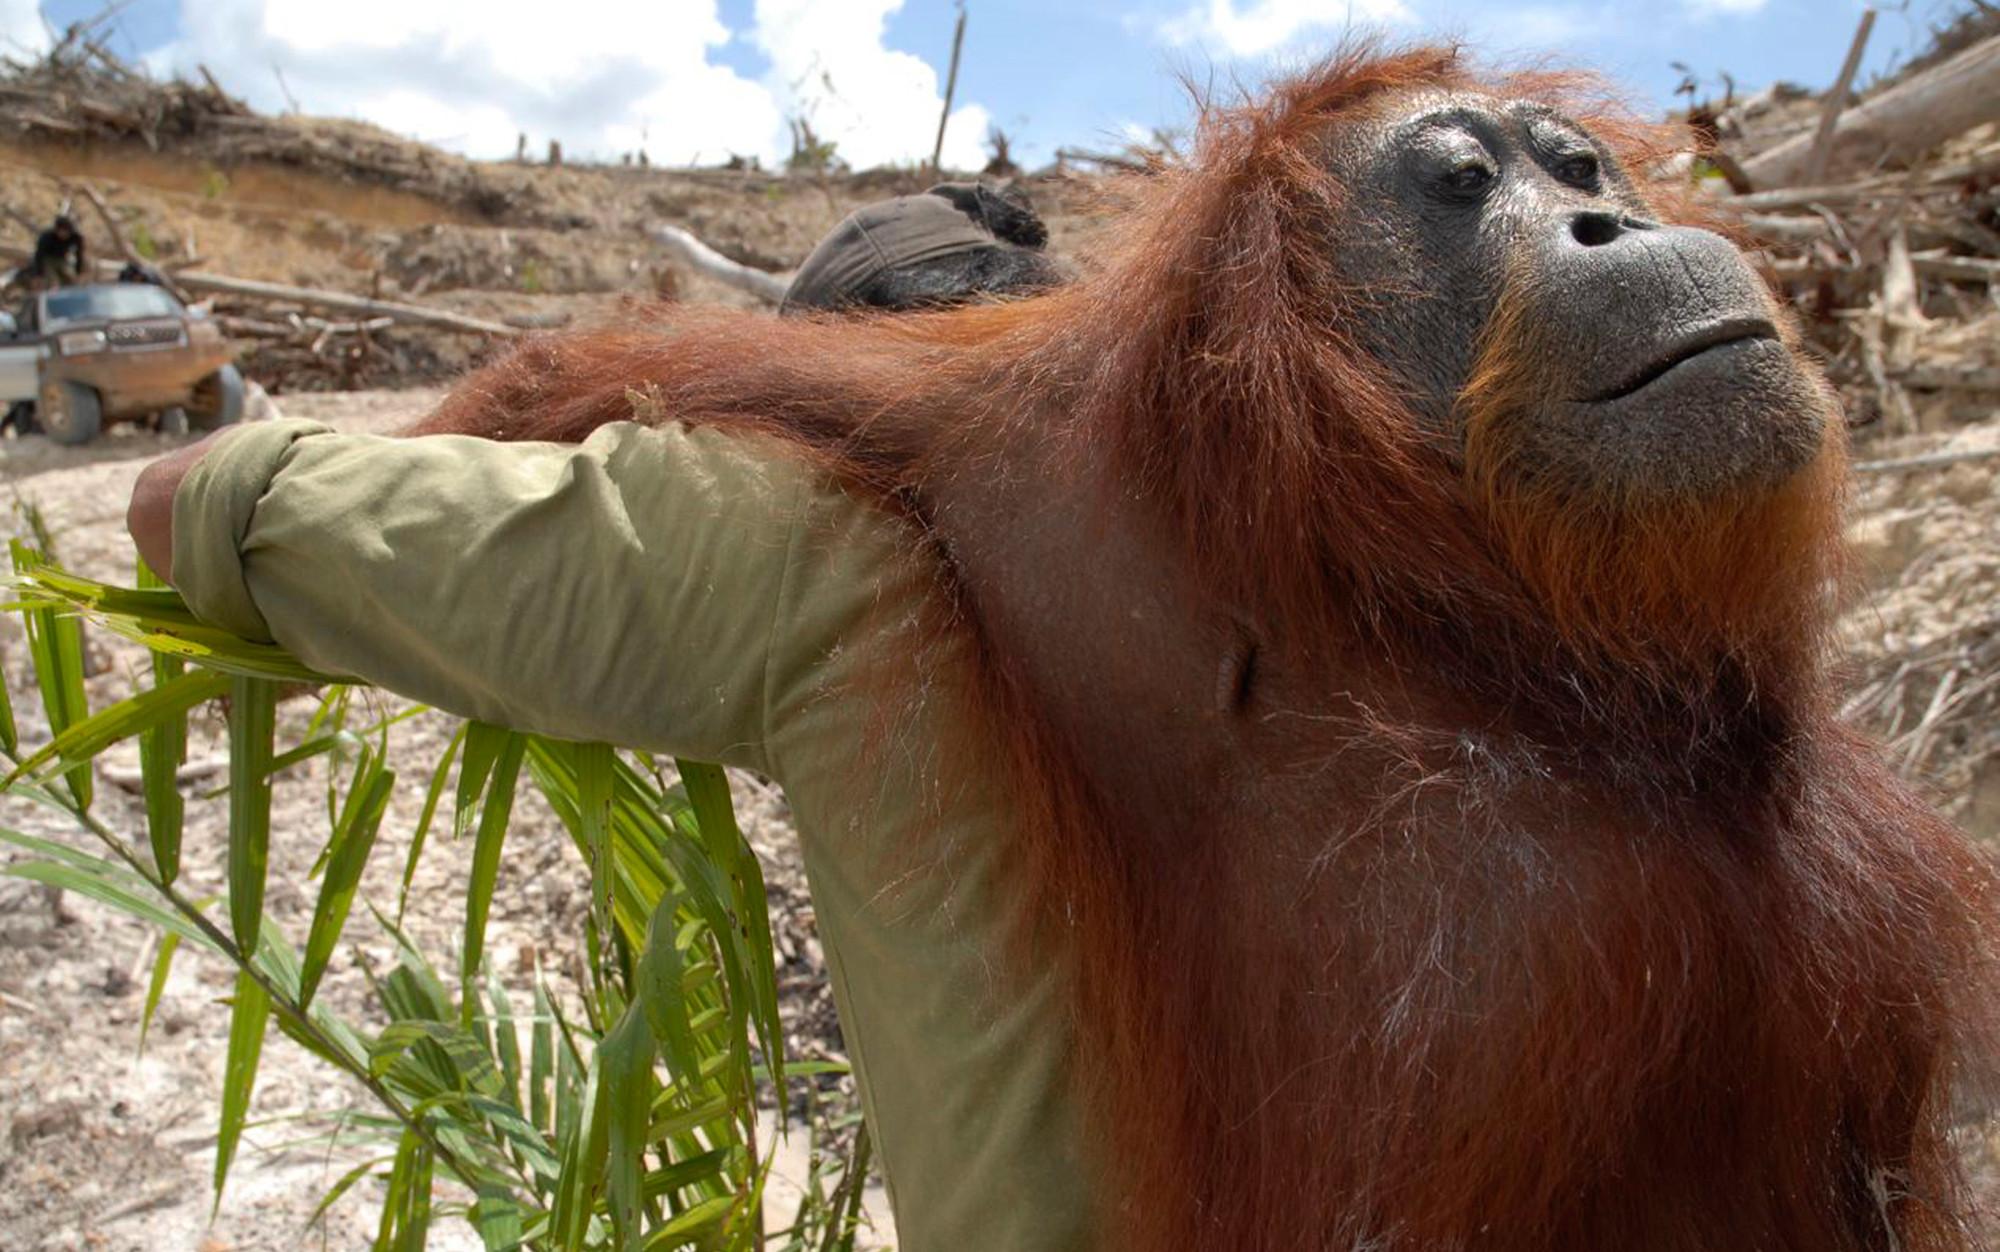 The orangutan trap | Aeon